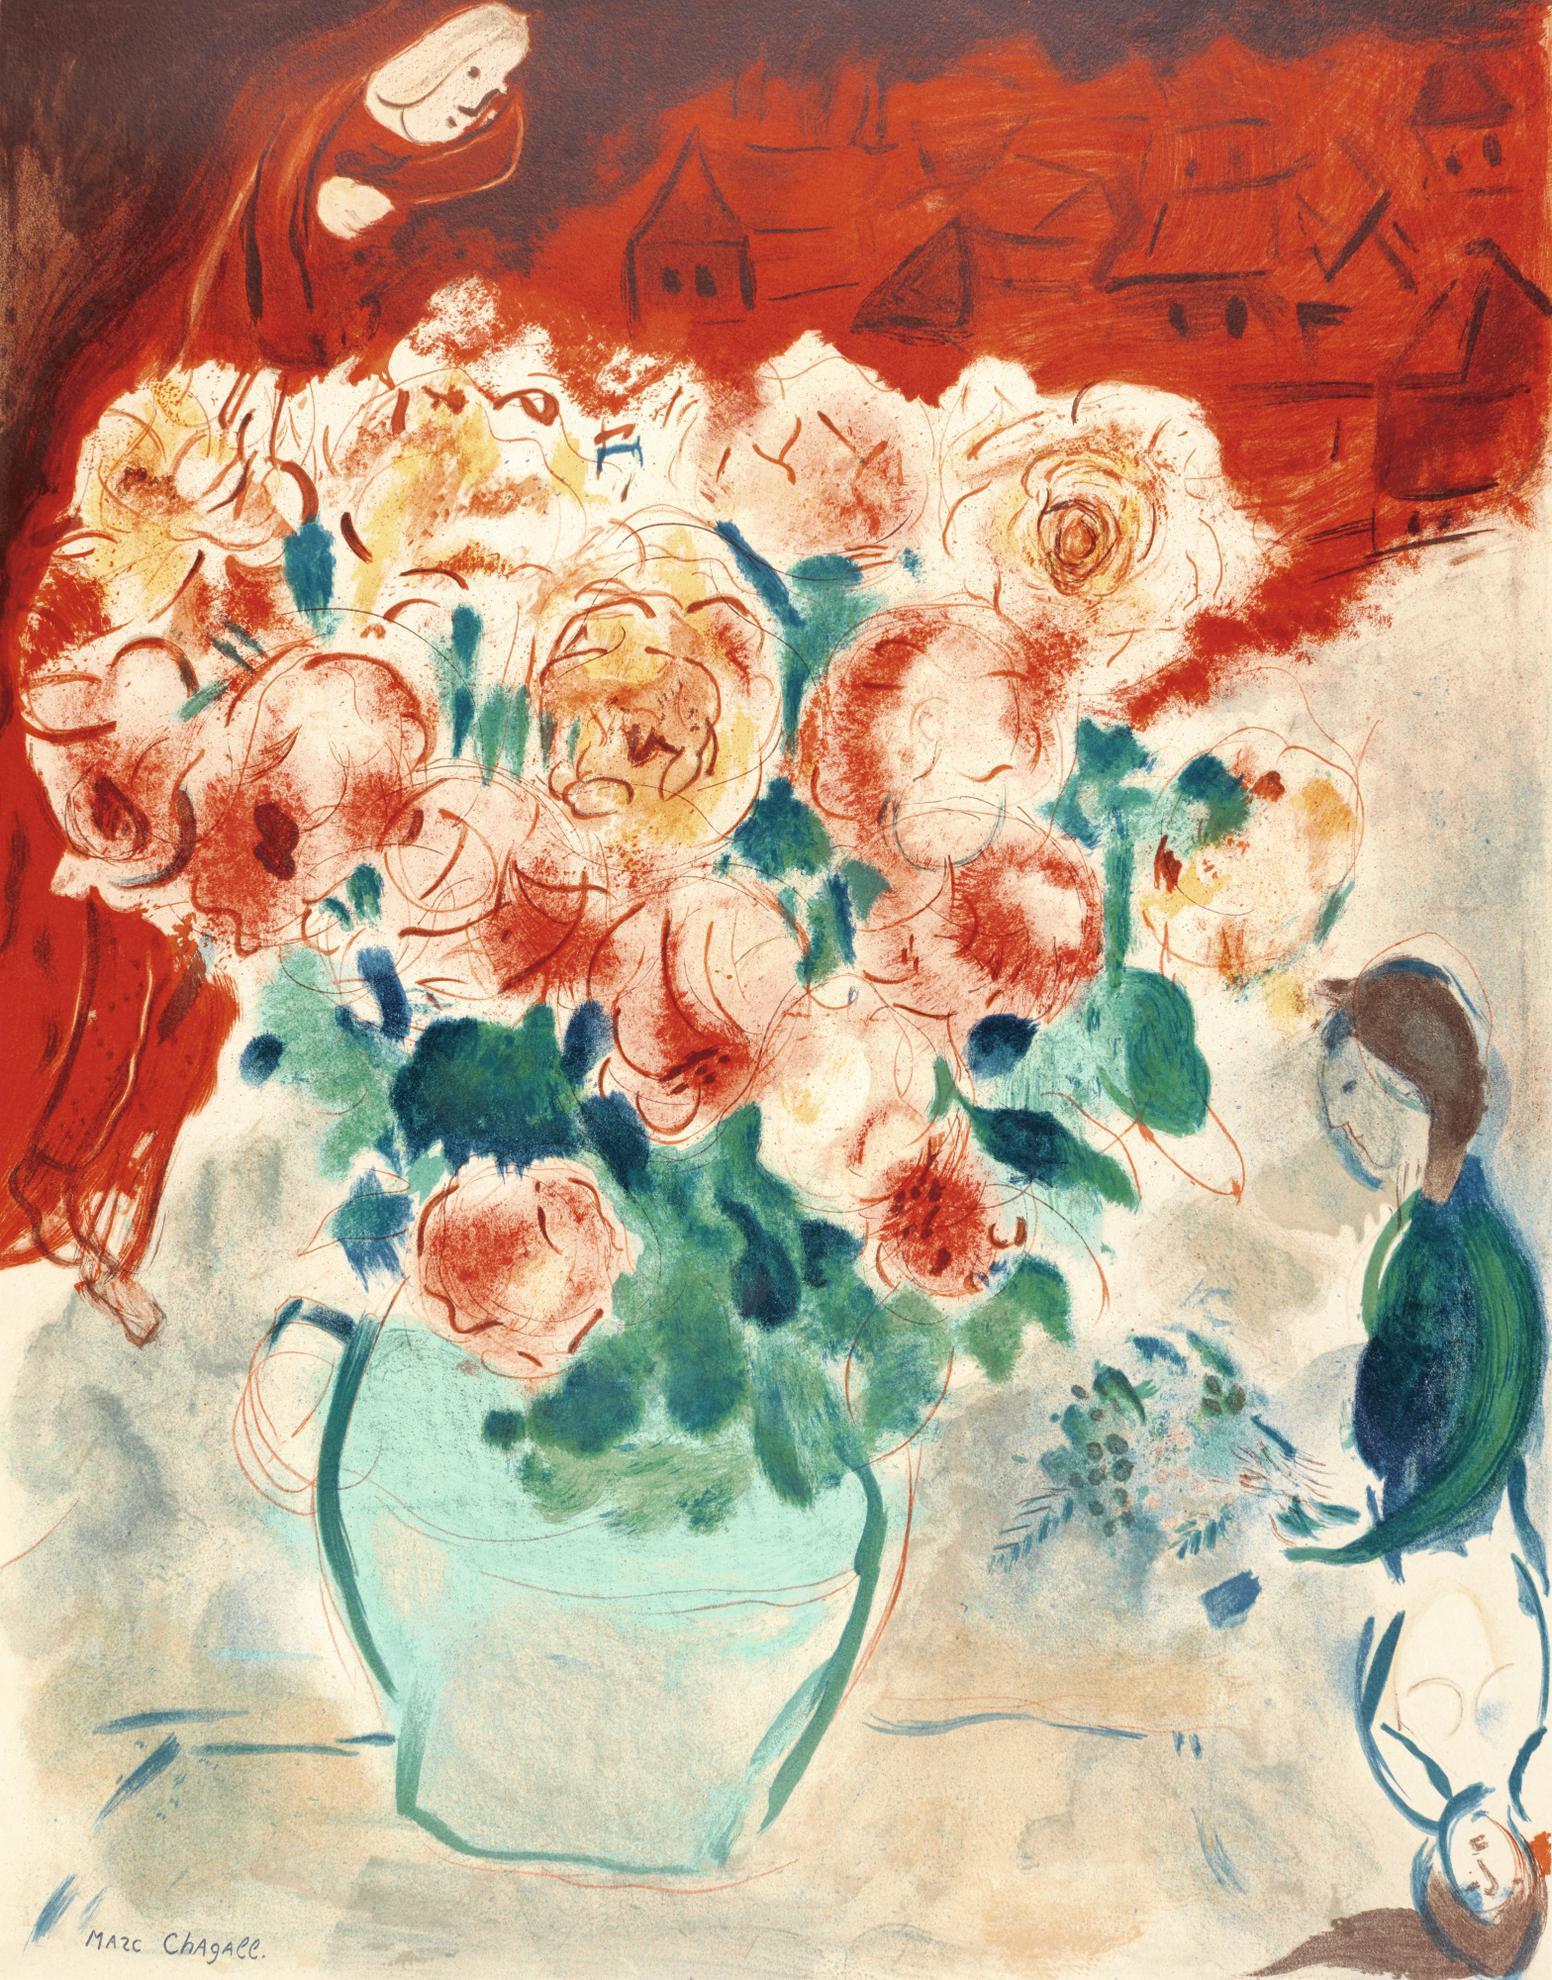 After Marc Chagall - Le Bouquet (Mourlot Charles Sorlier 8)-1955